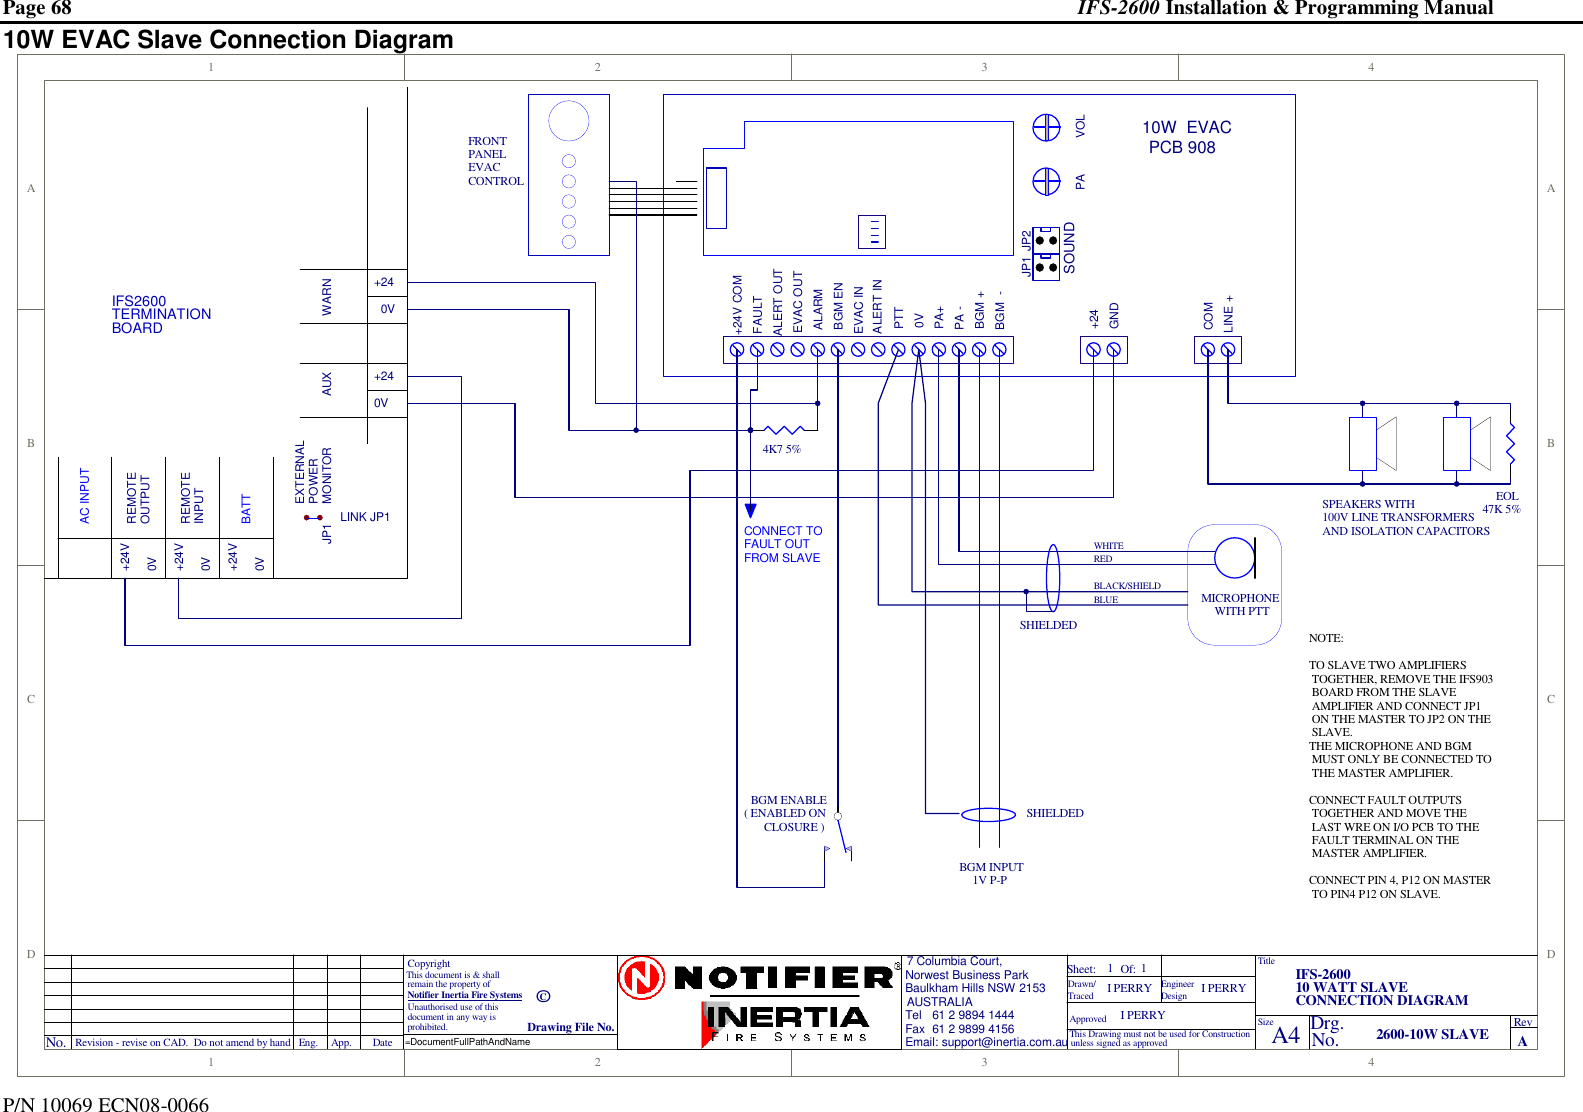 Honeywell Notifier Ifs 2600 Users Manual Install V3_01